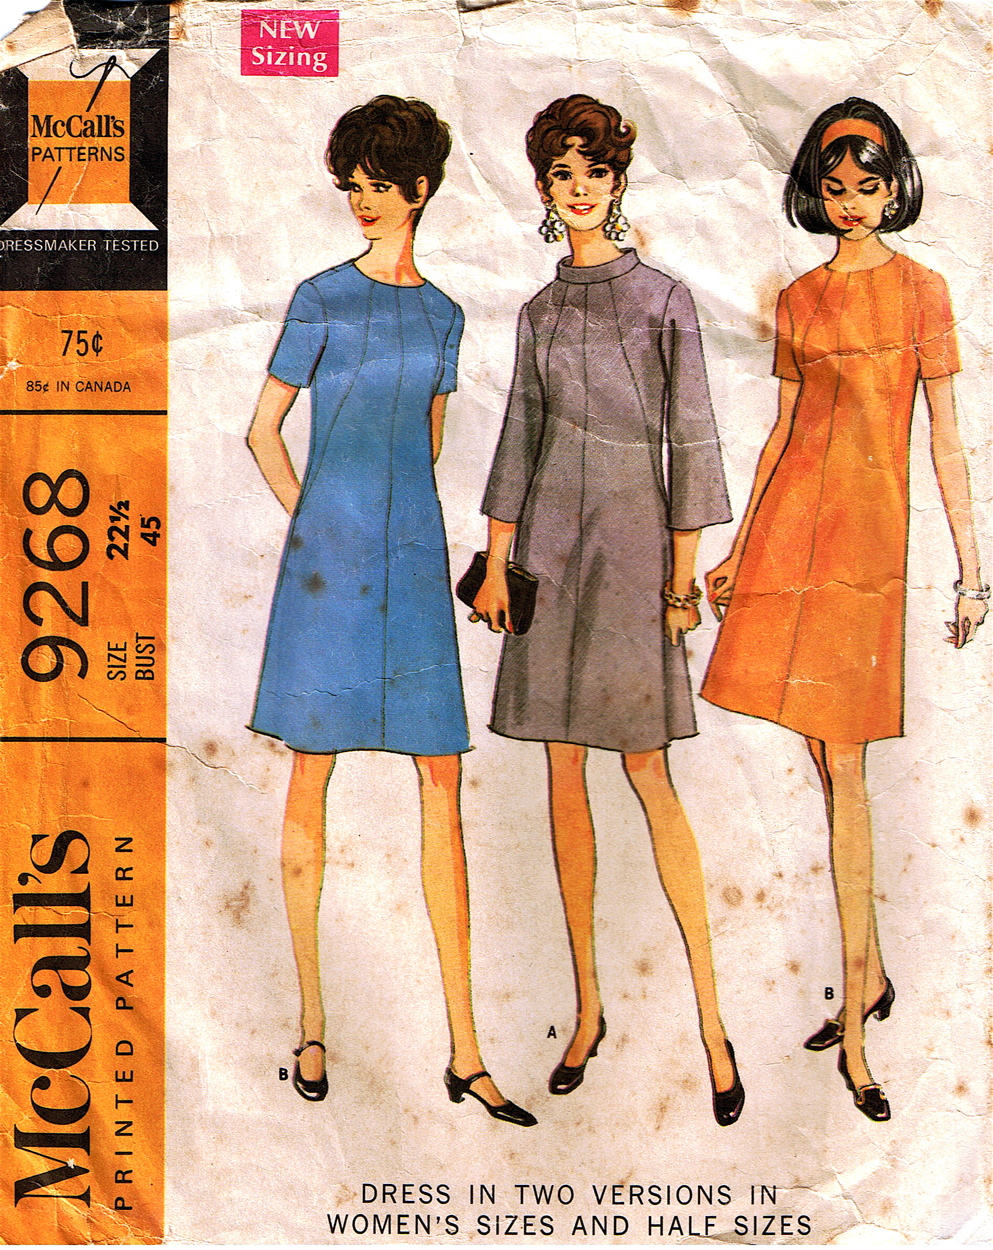 McCall's 9268